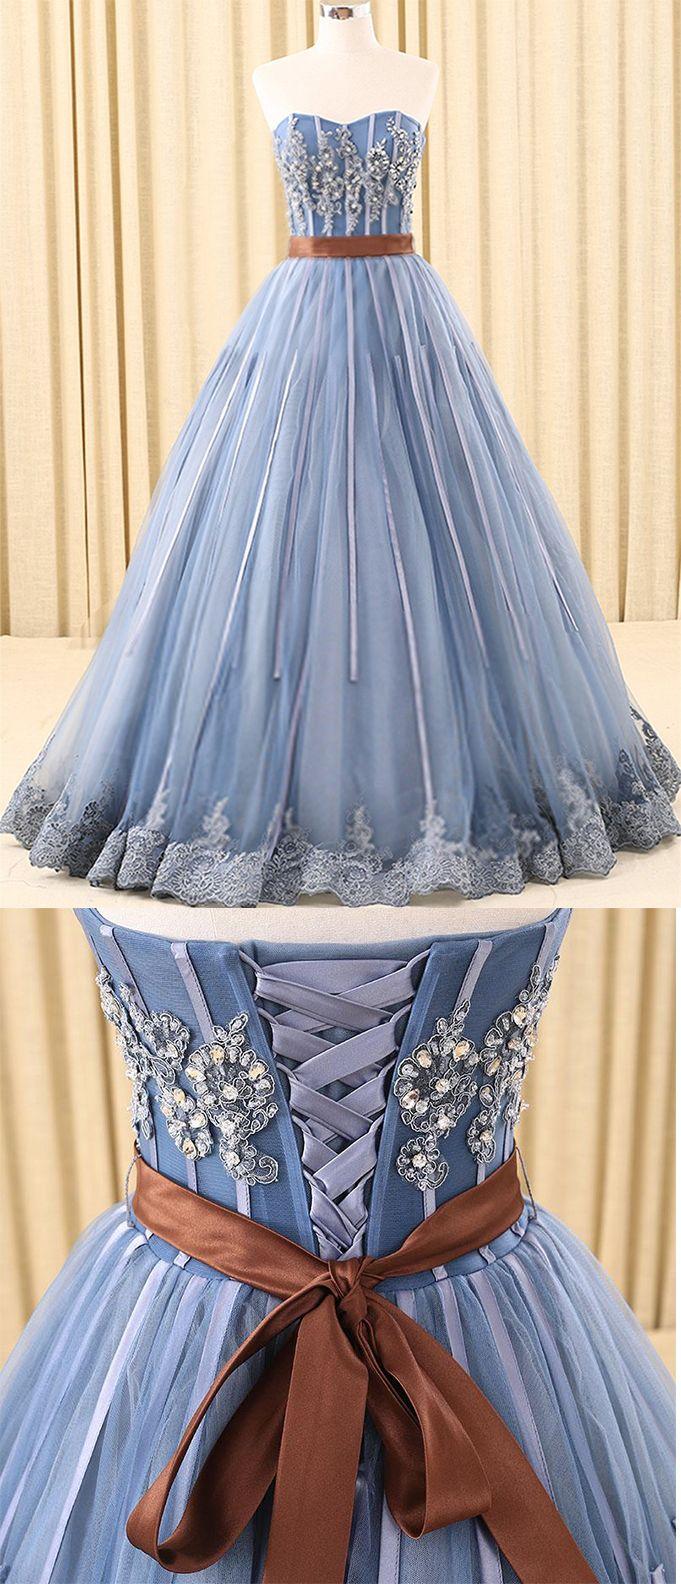 Aline prom gownsweetheart prom dressesfloorlength prom dress